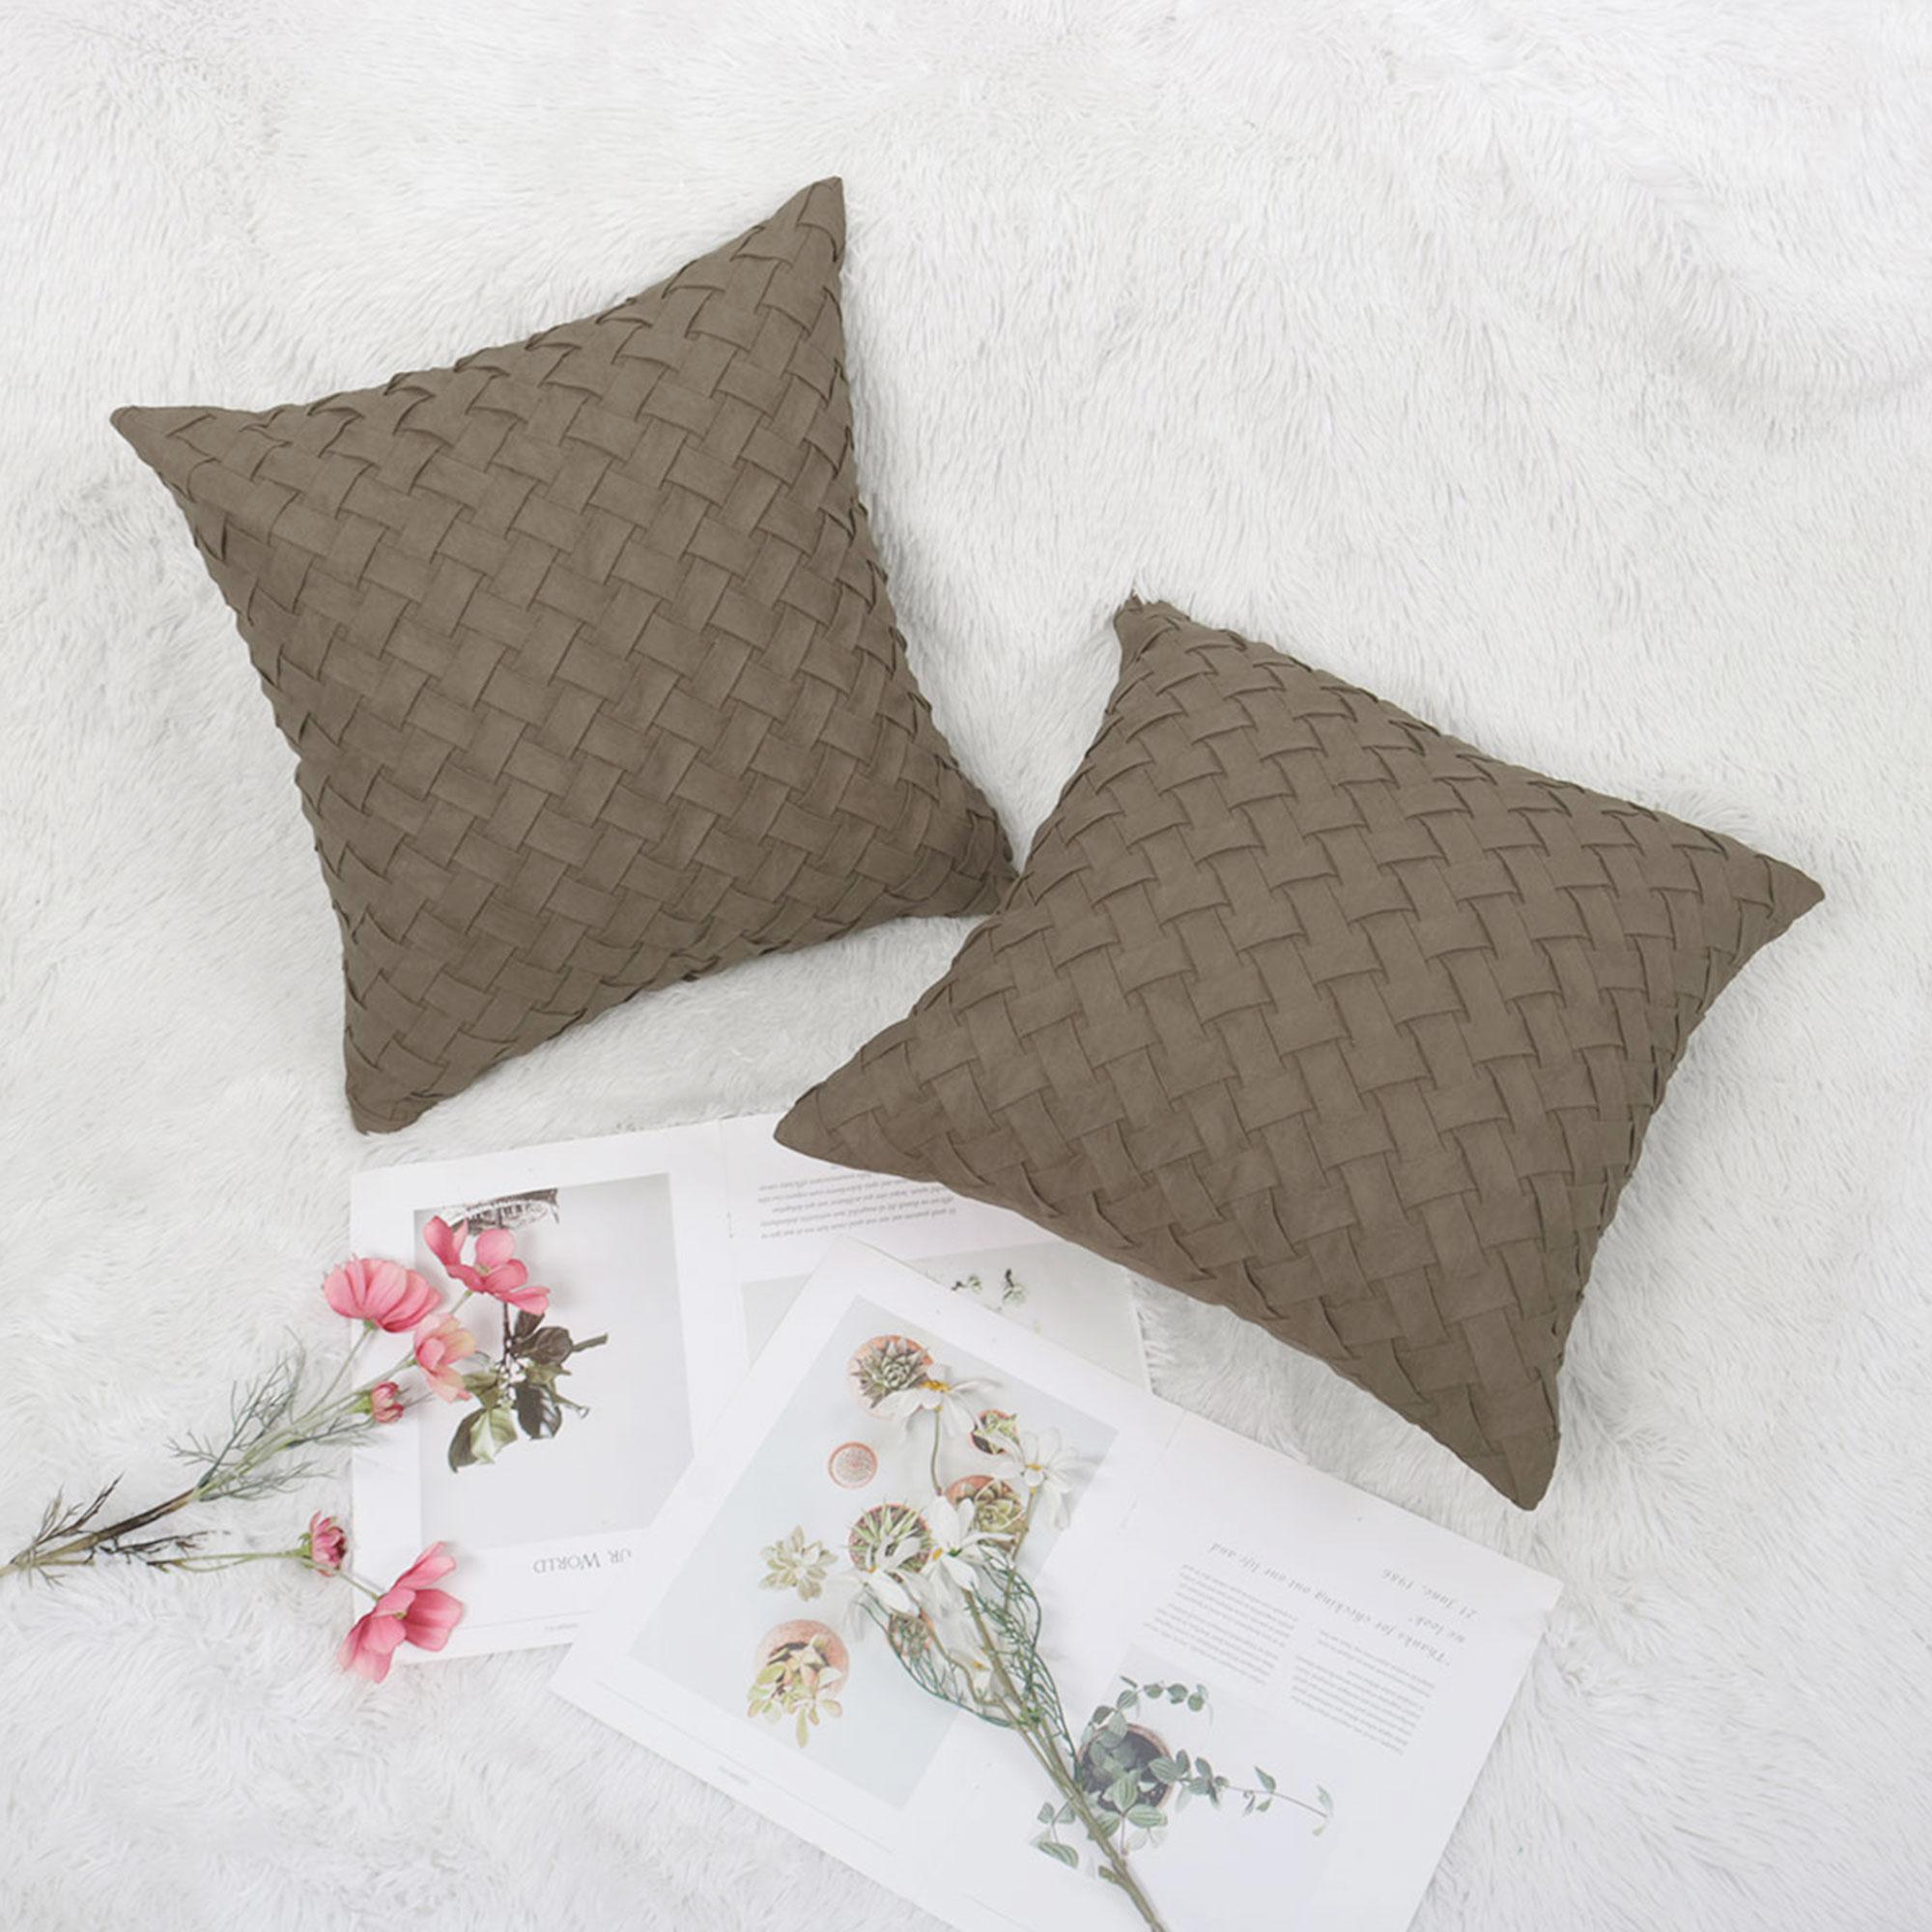 piccocasa basket weave polyester throw pillow case 2pcs 18 x18 coffee color